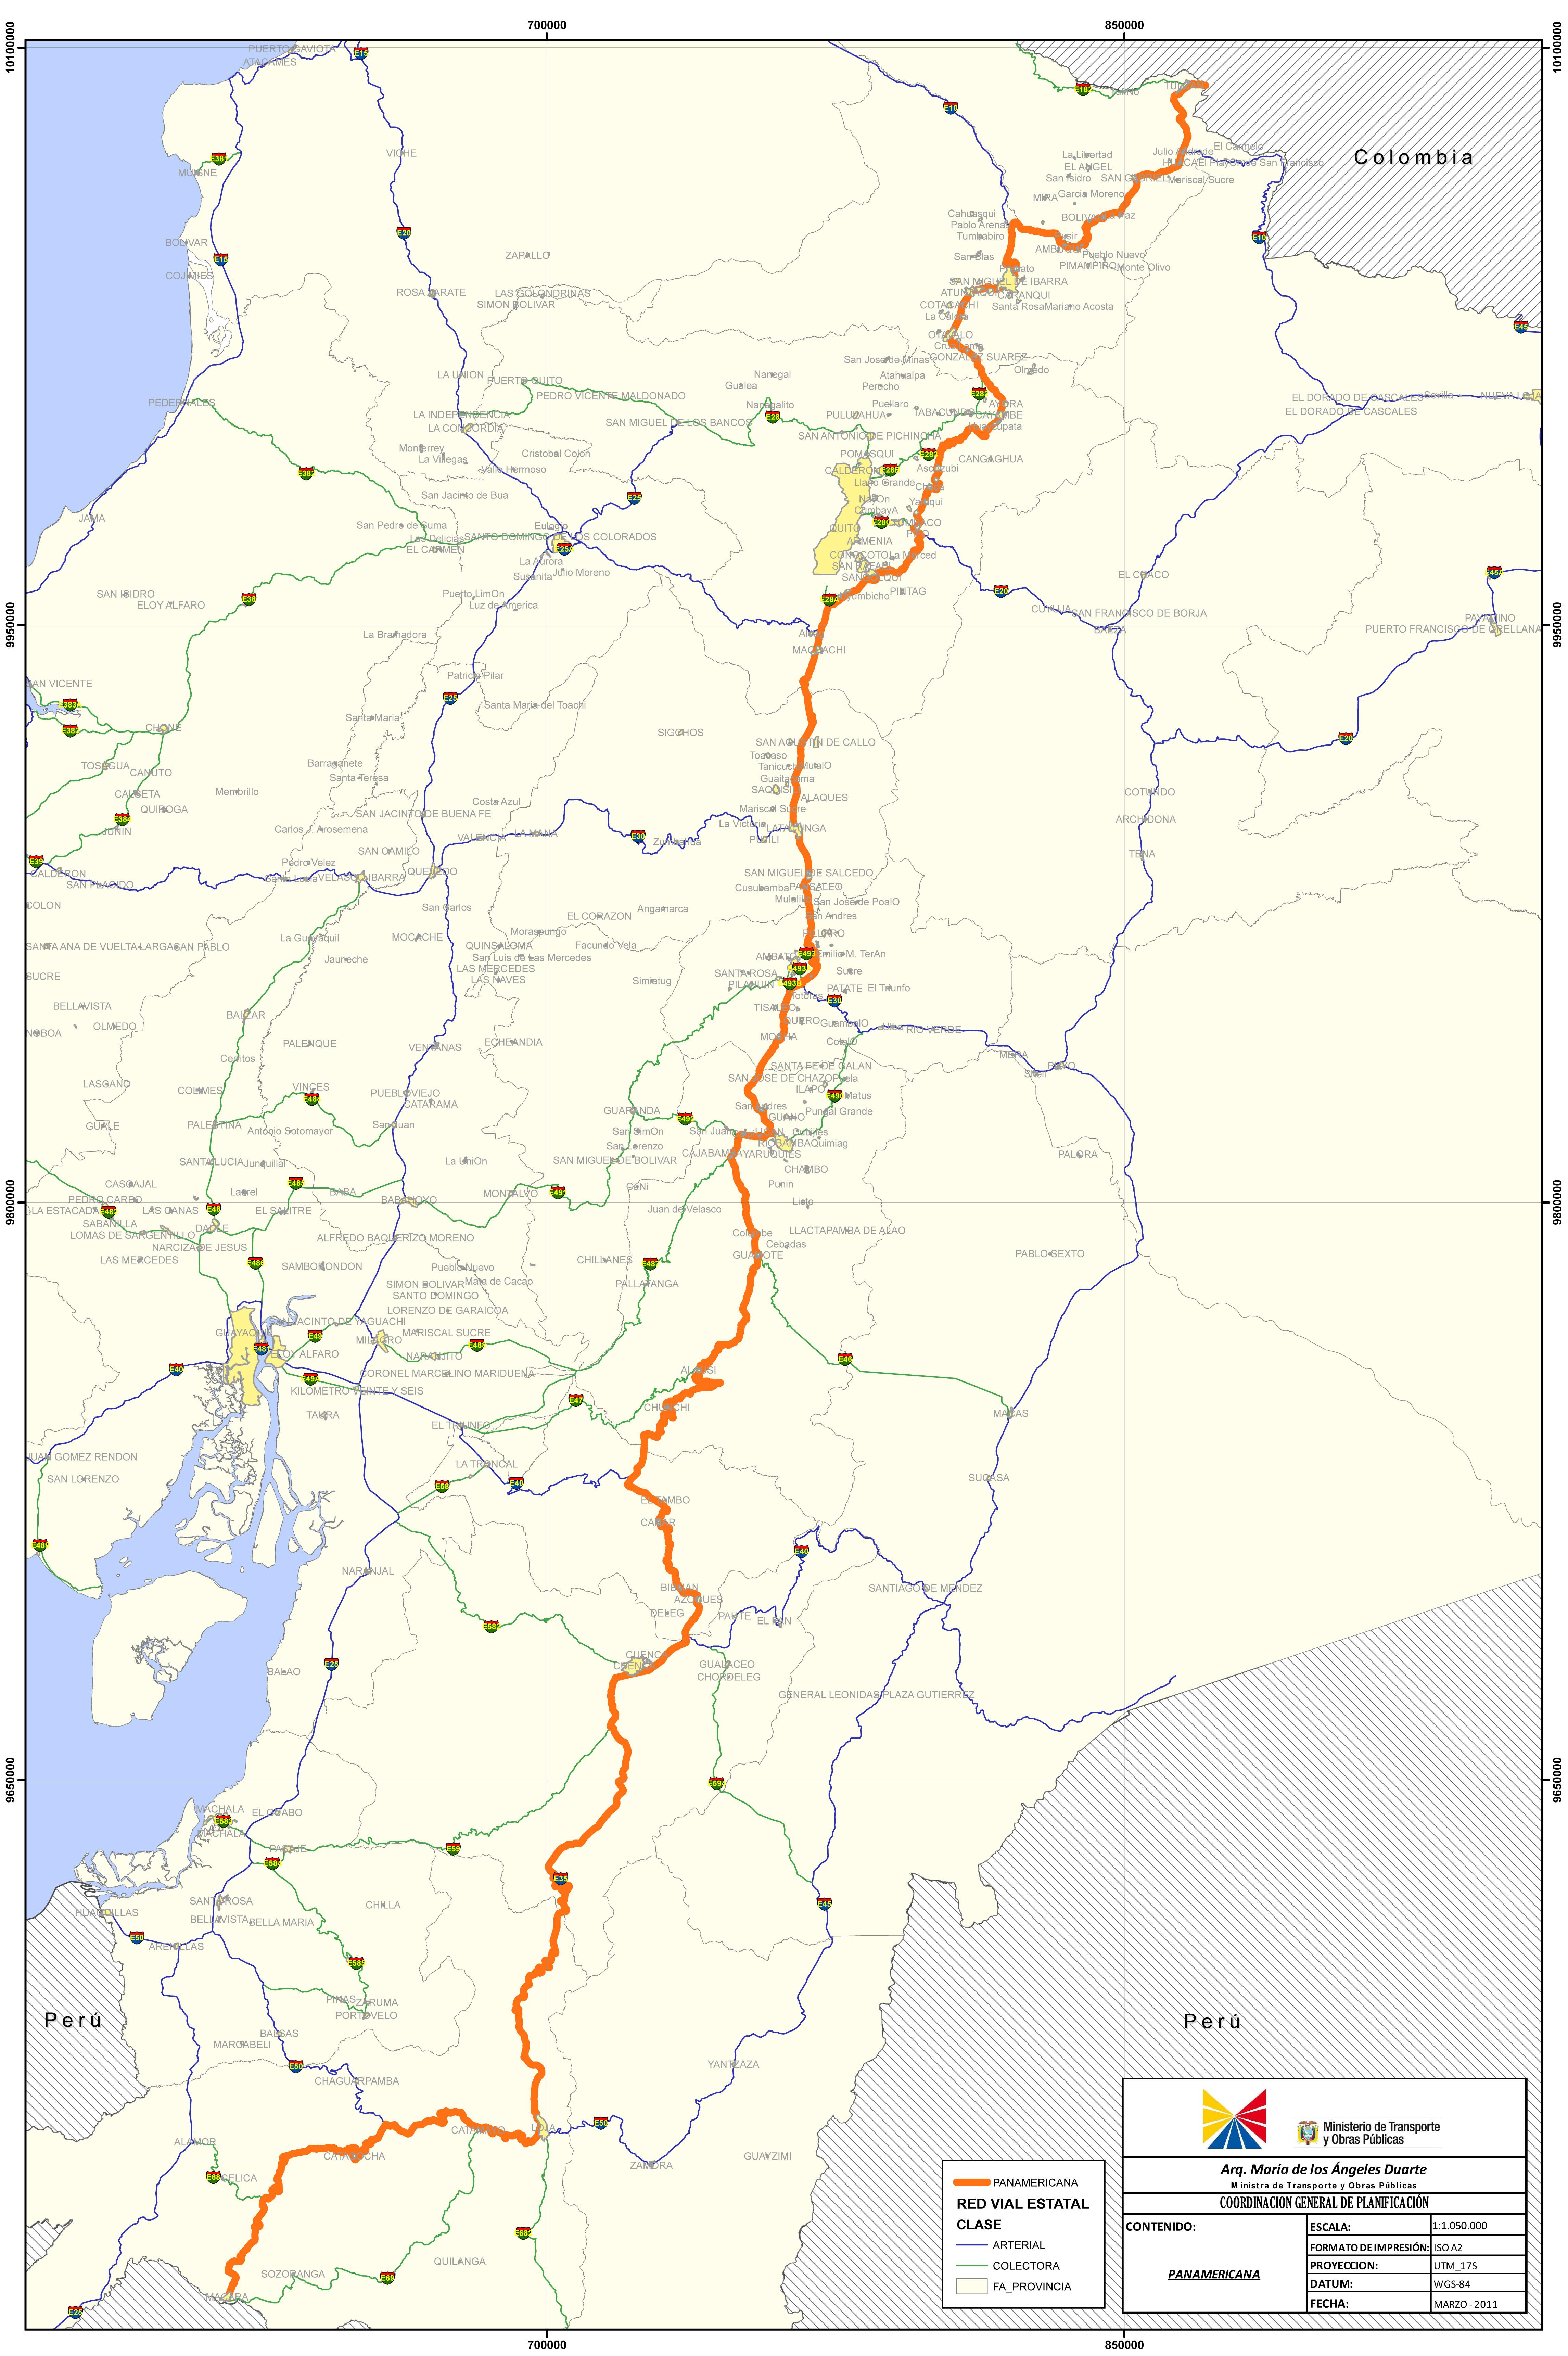 The Pan-American Highway in Ecuador 2011